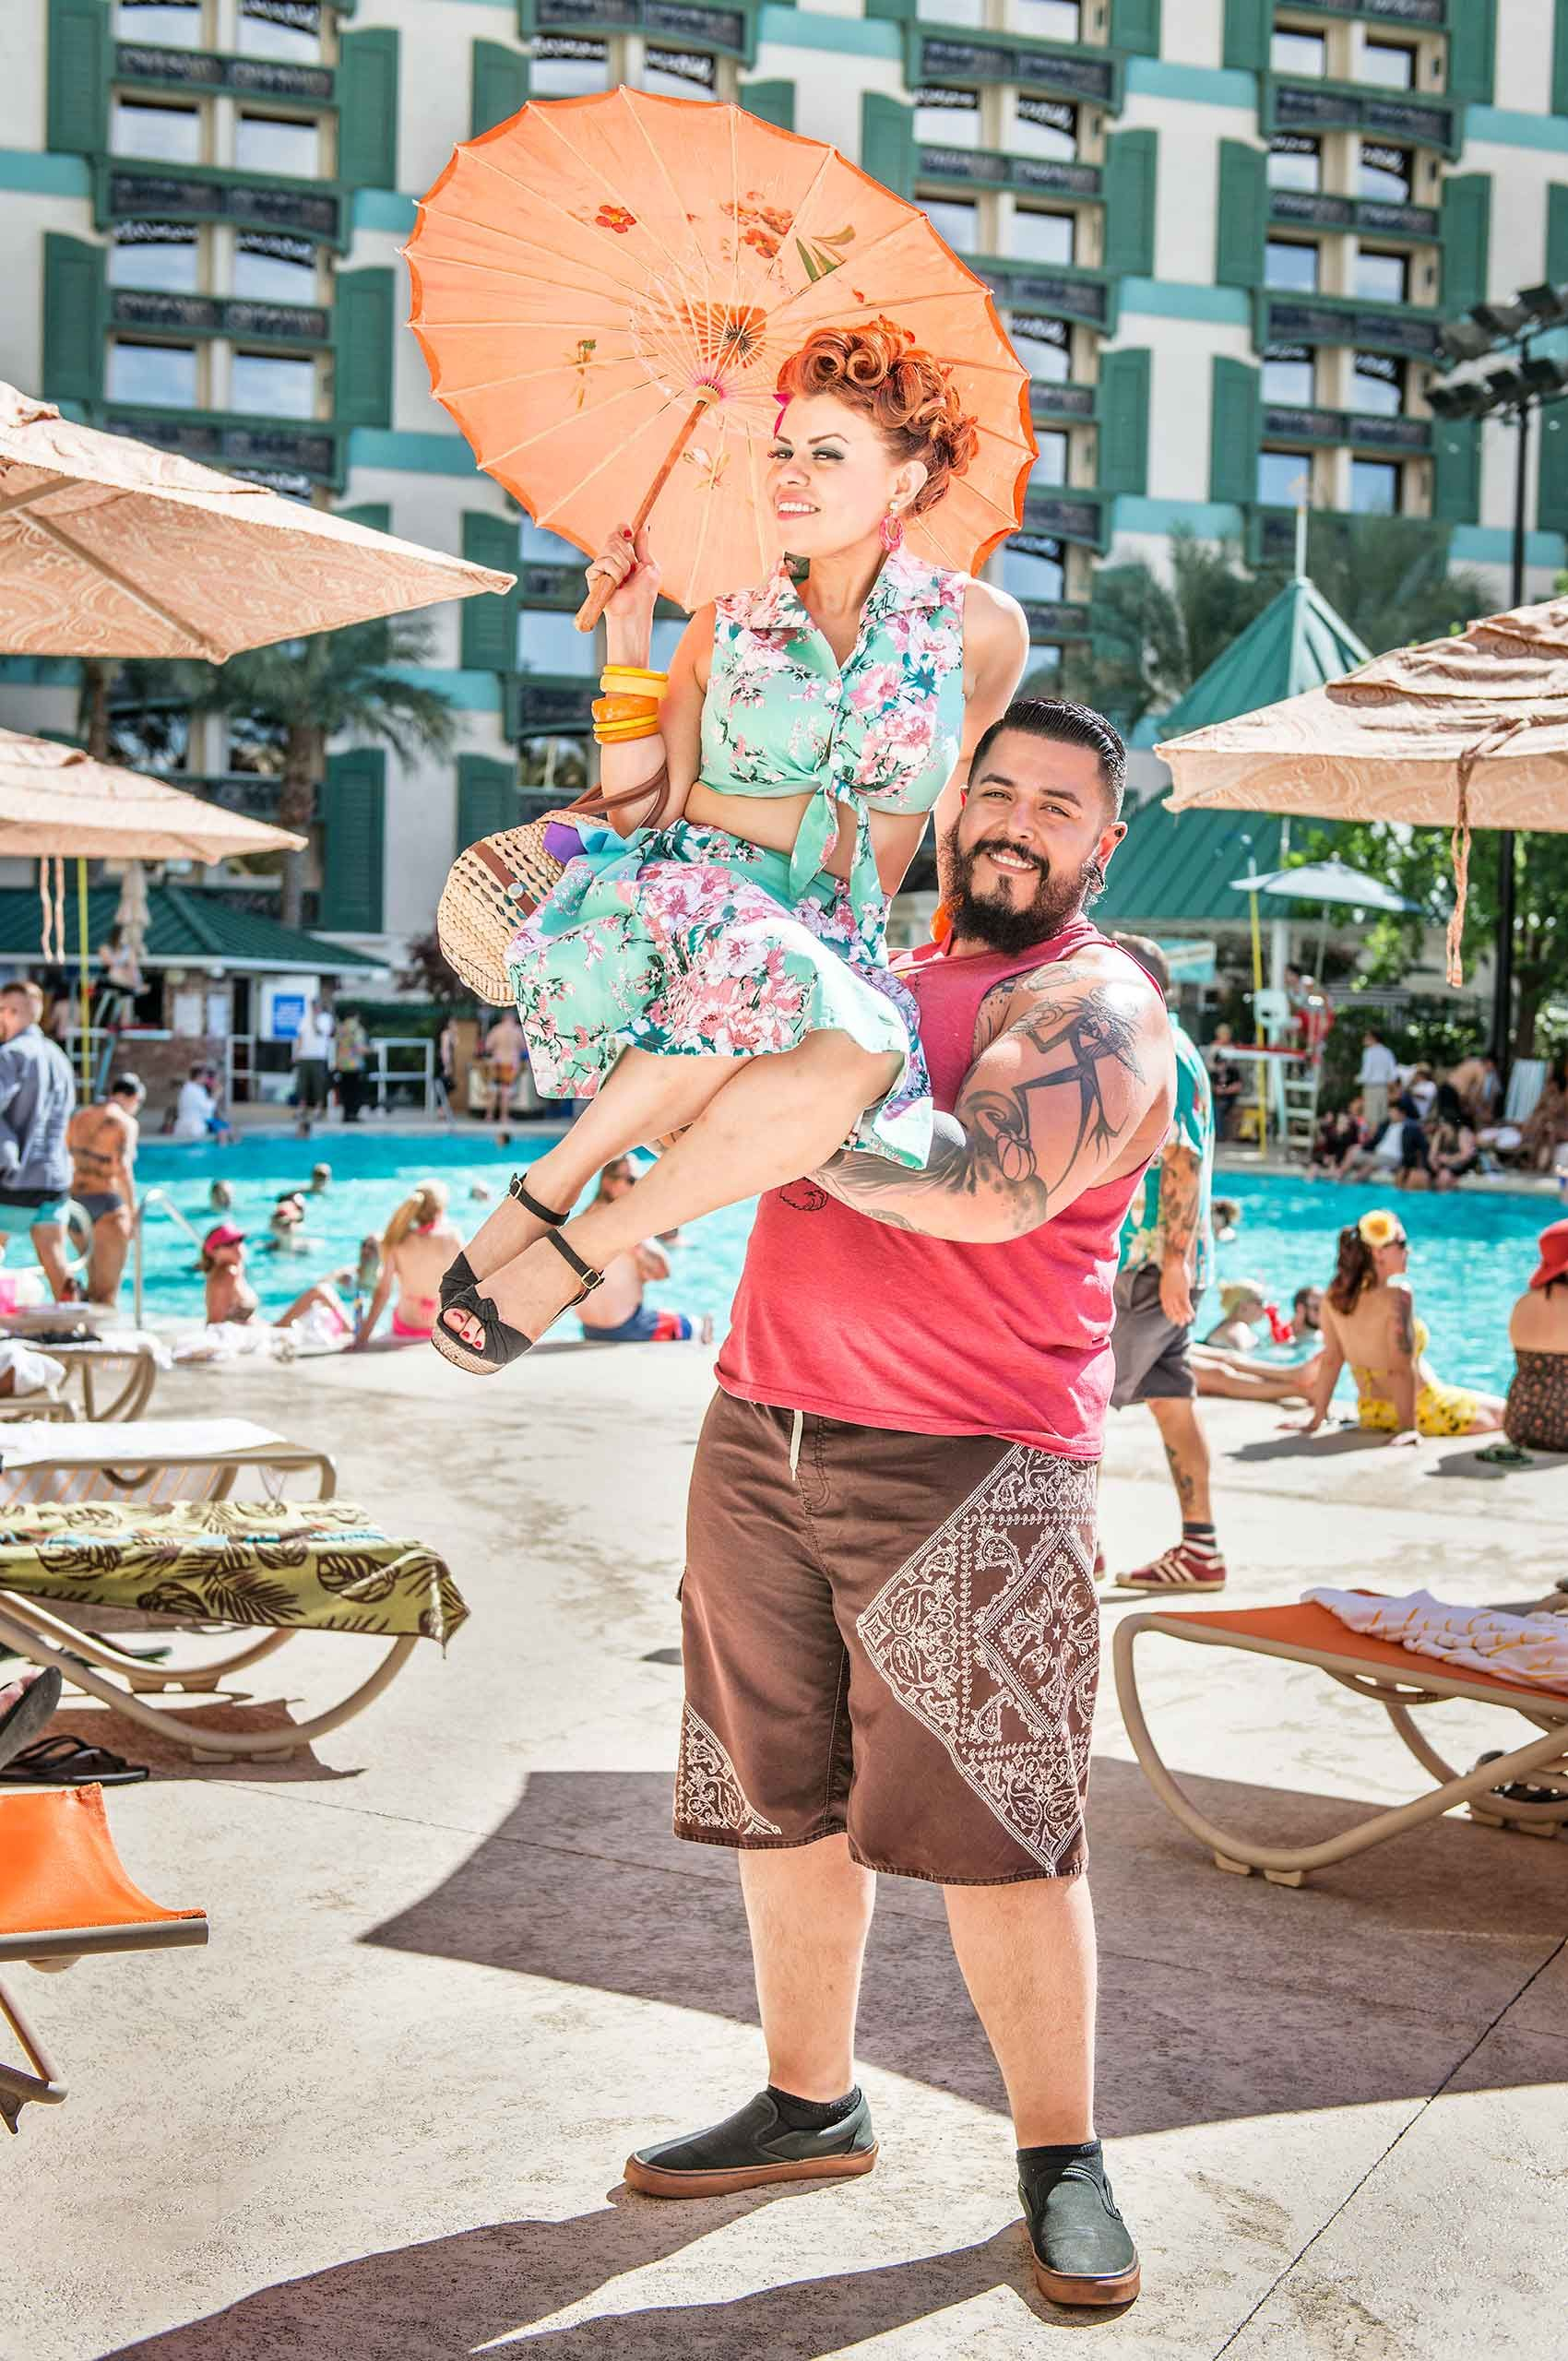 man-lifting-woman-vivalasvegas-rockabillyweekend-lasvegas-by-henrikolundphotography.jpg